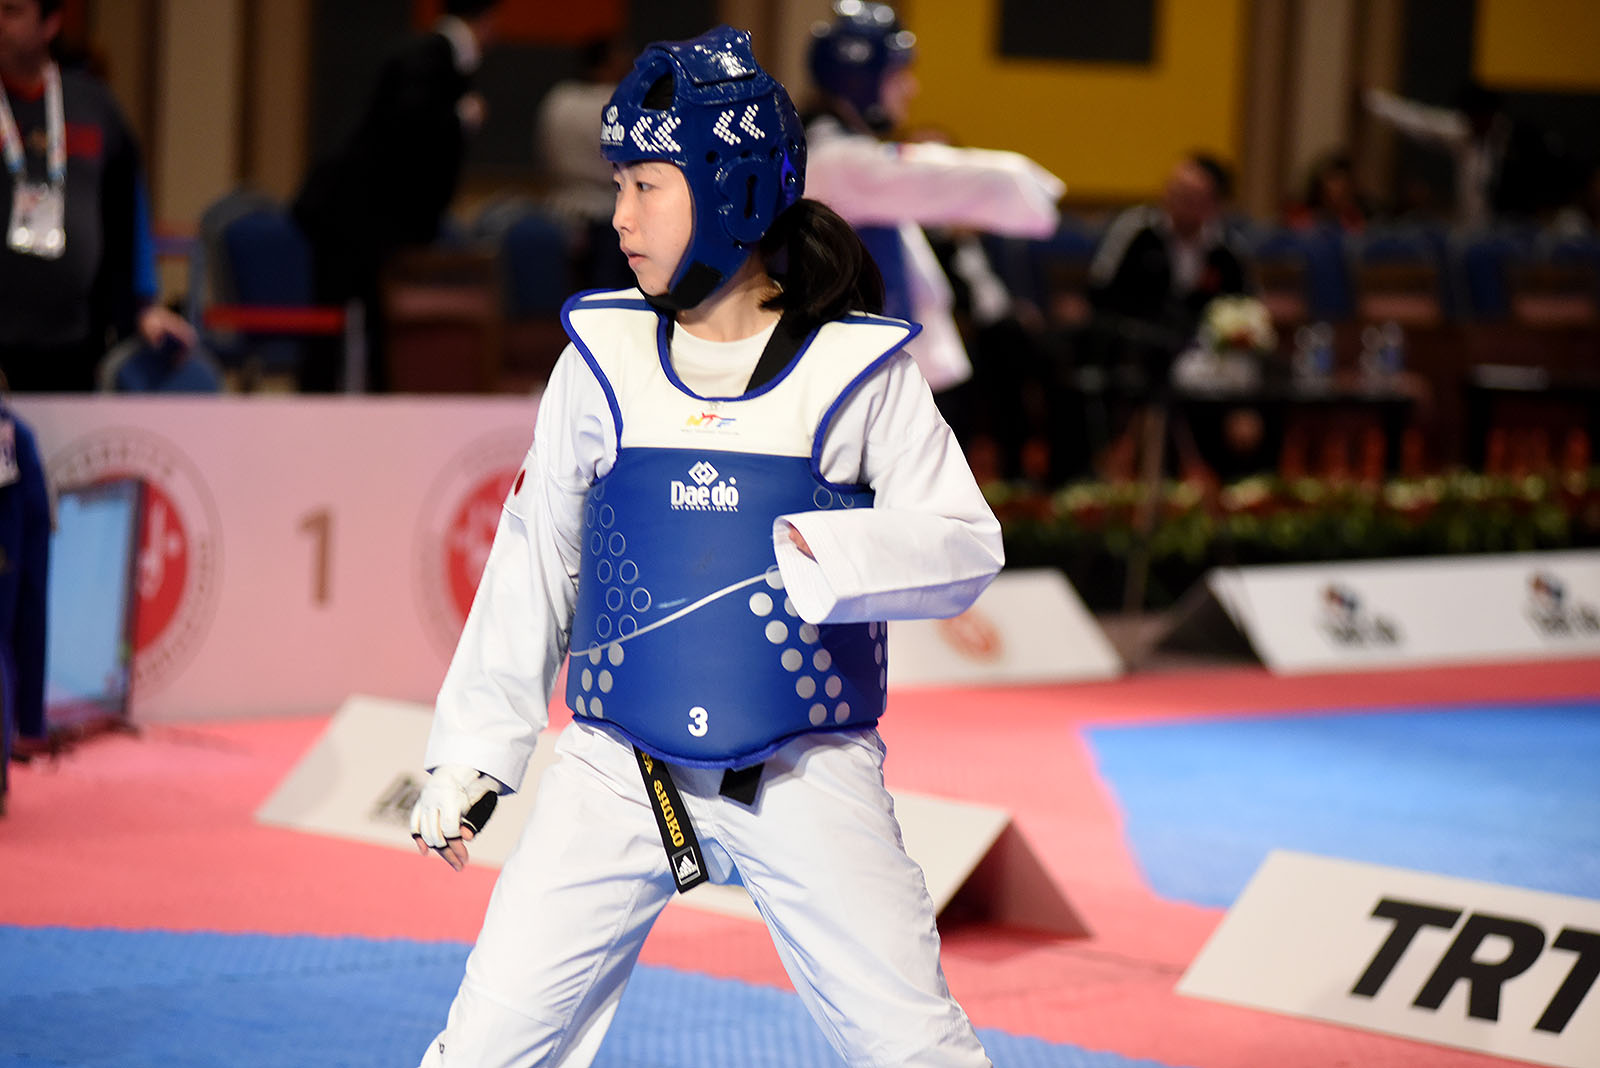 DAY 2 – Antalya 2019 World Para Taekwondo Championships..